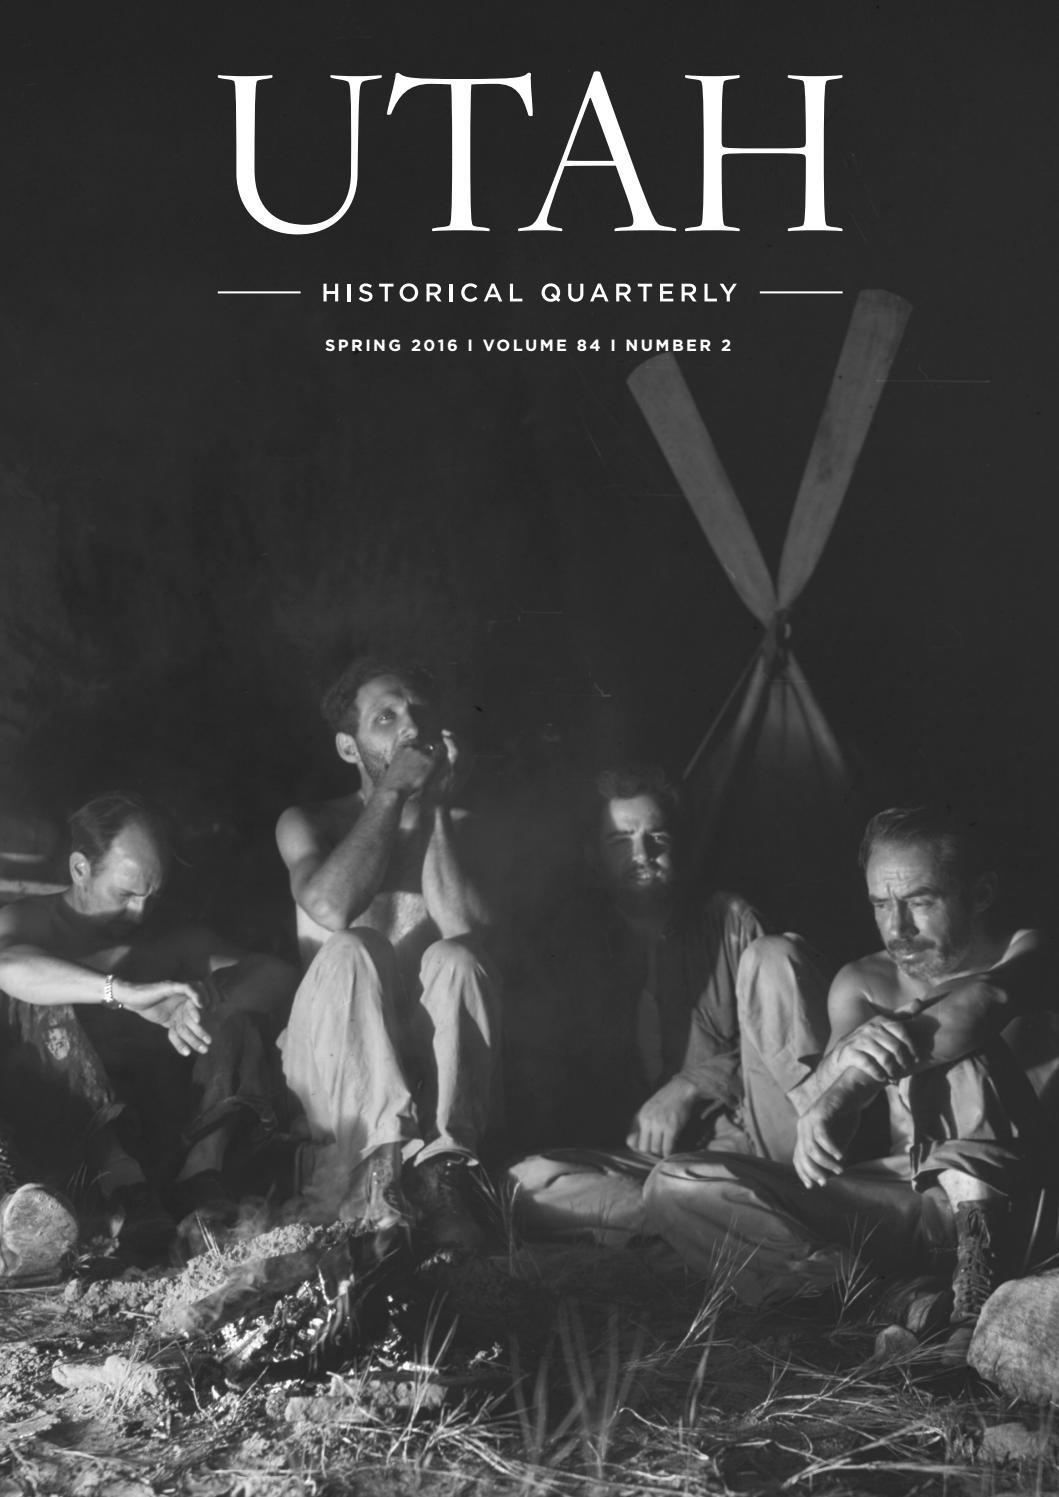 Utah Historical Quarterly, Volume 84, Number 2, 2016 by Utah